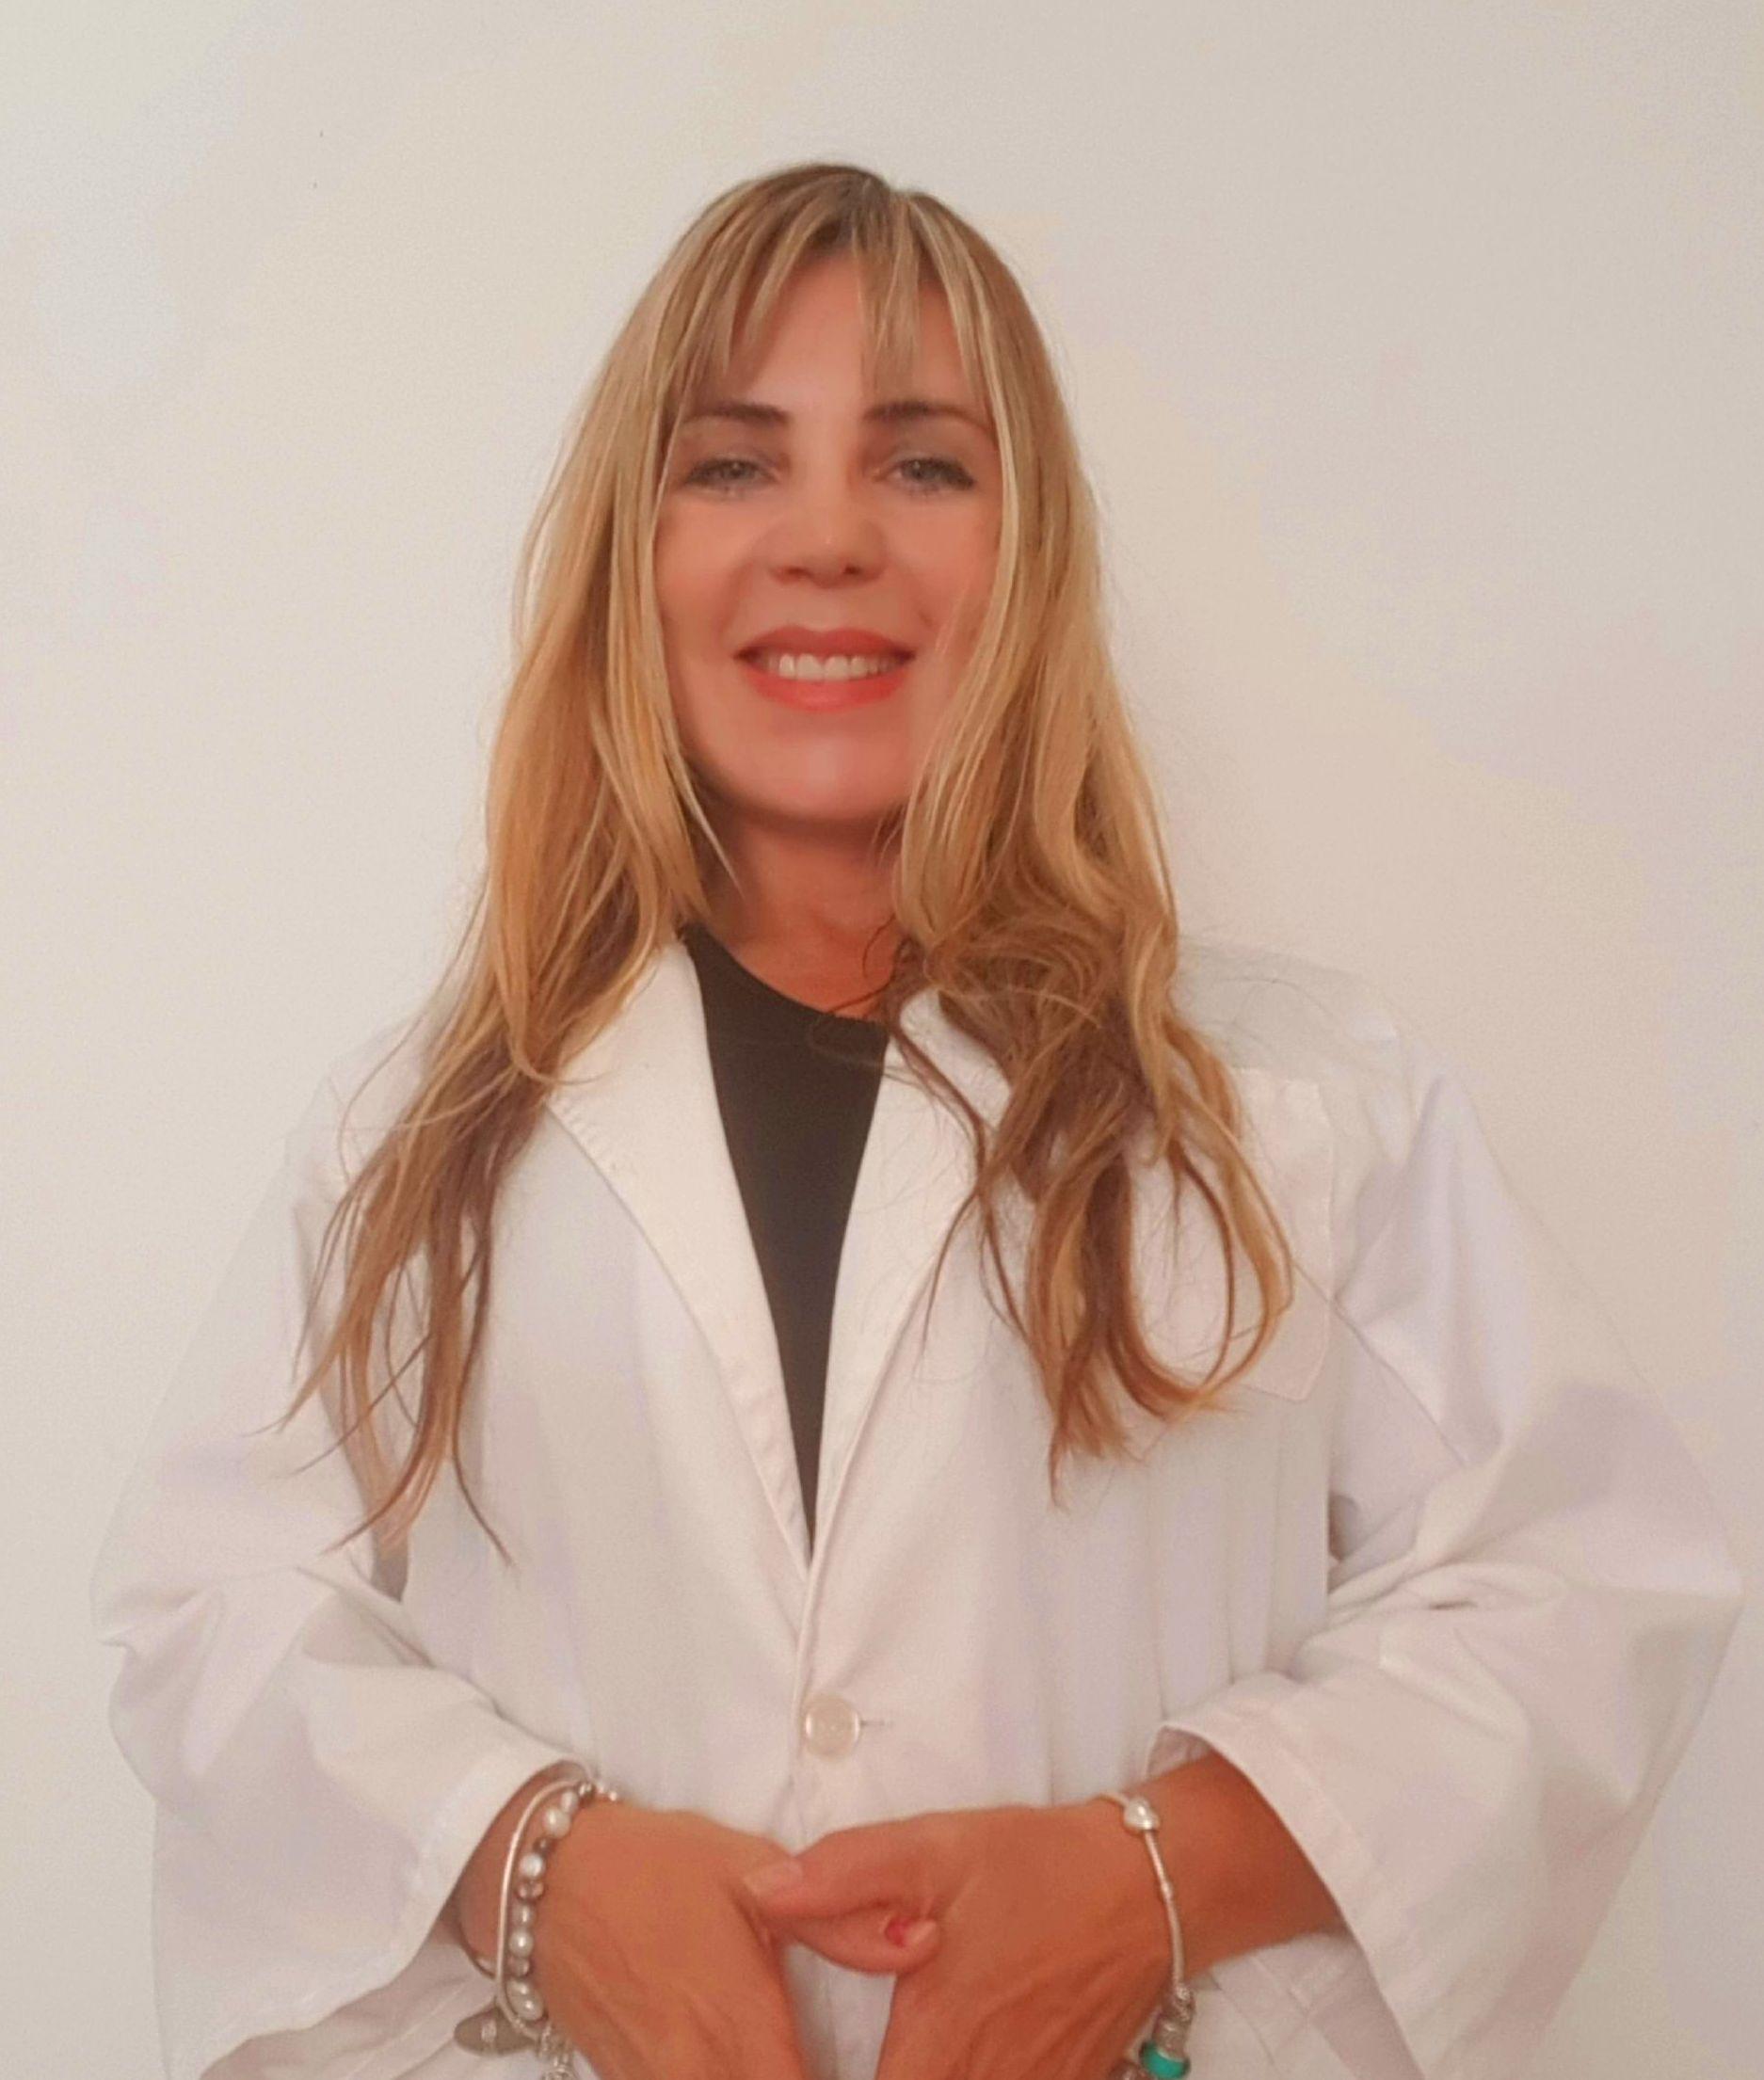 Salud MATZ Tenerife Sur Sanitas sanitas cura terapias